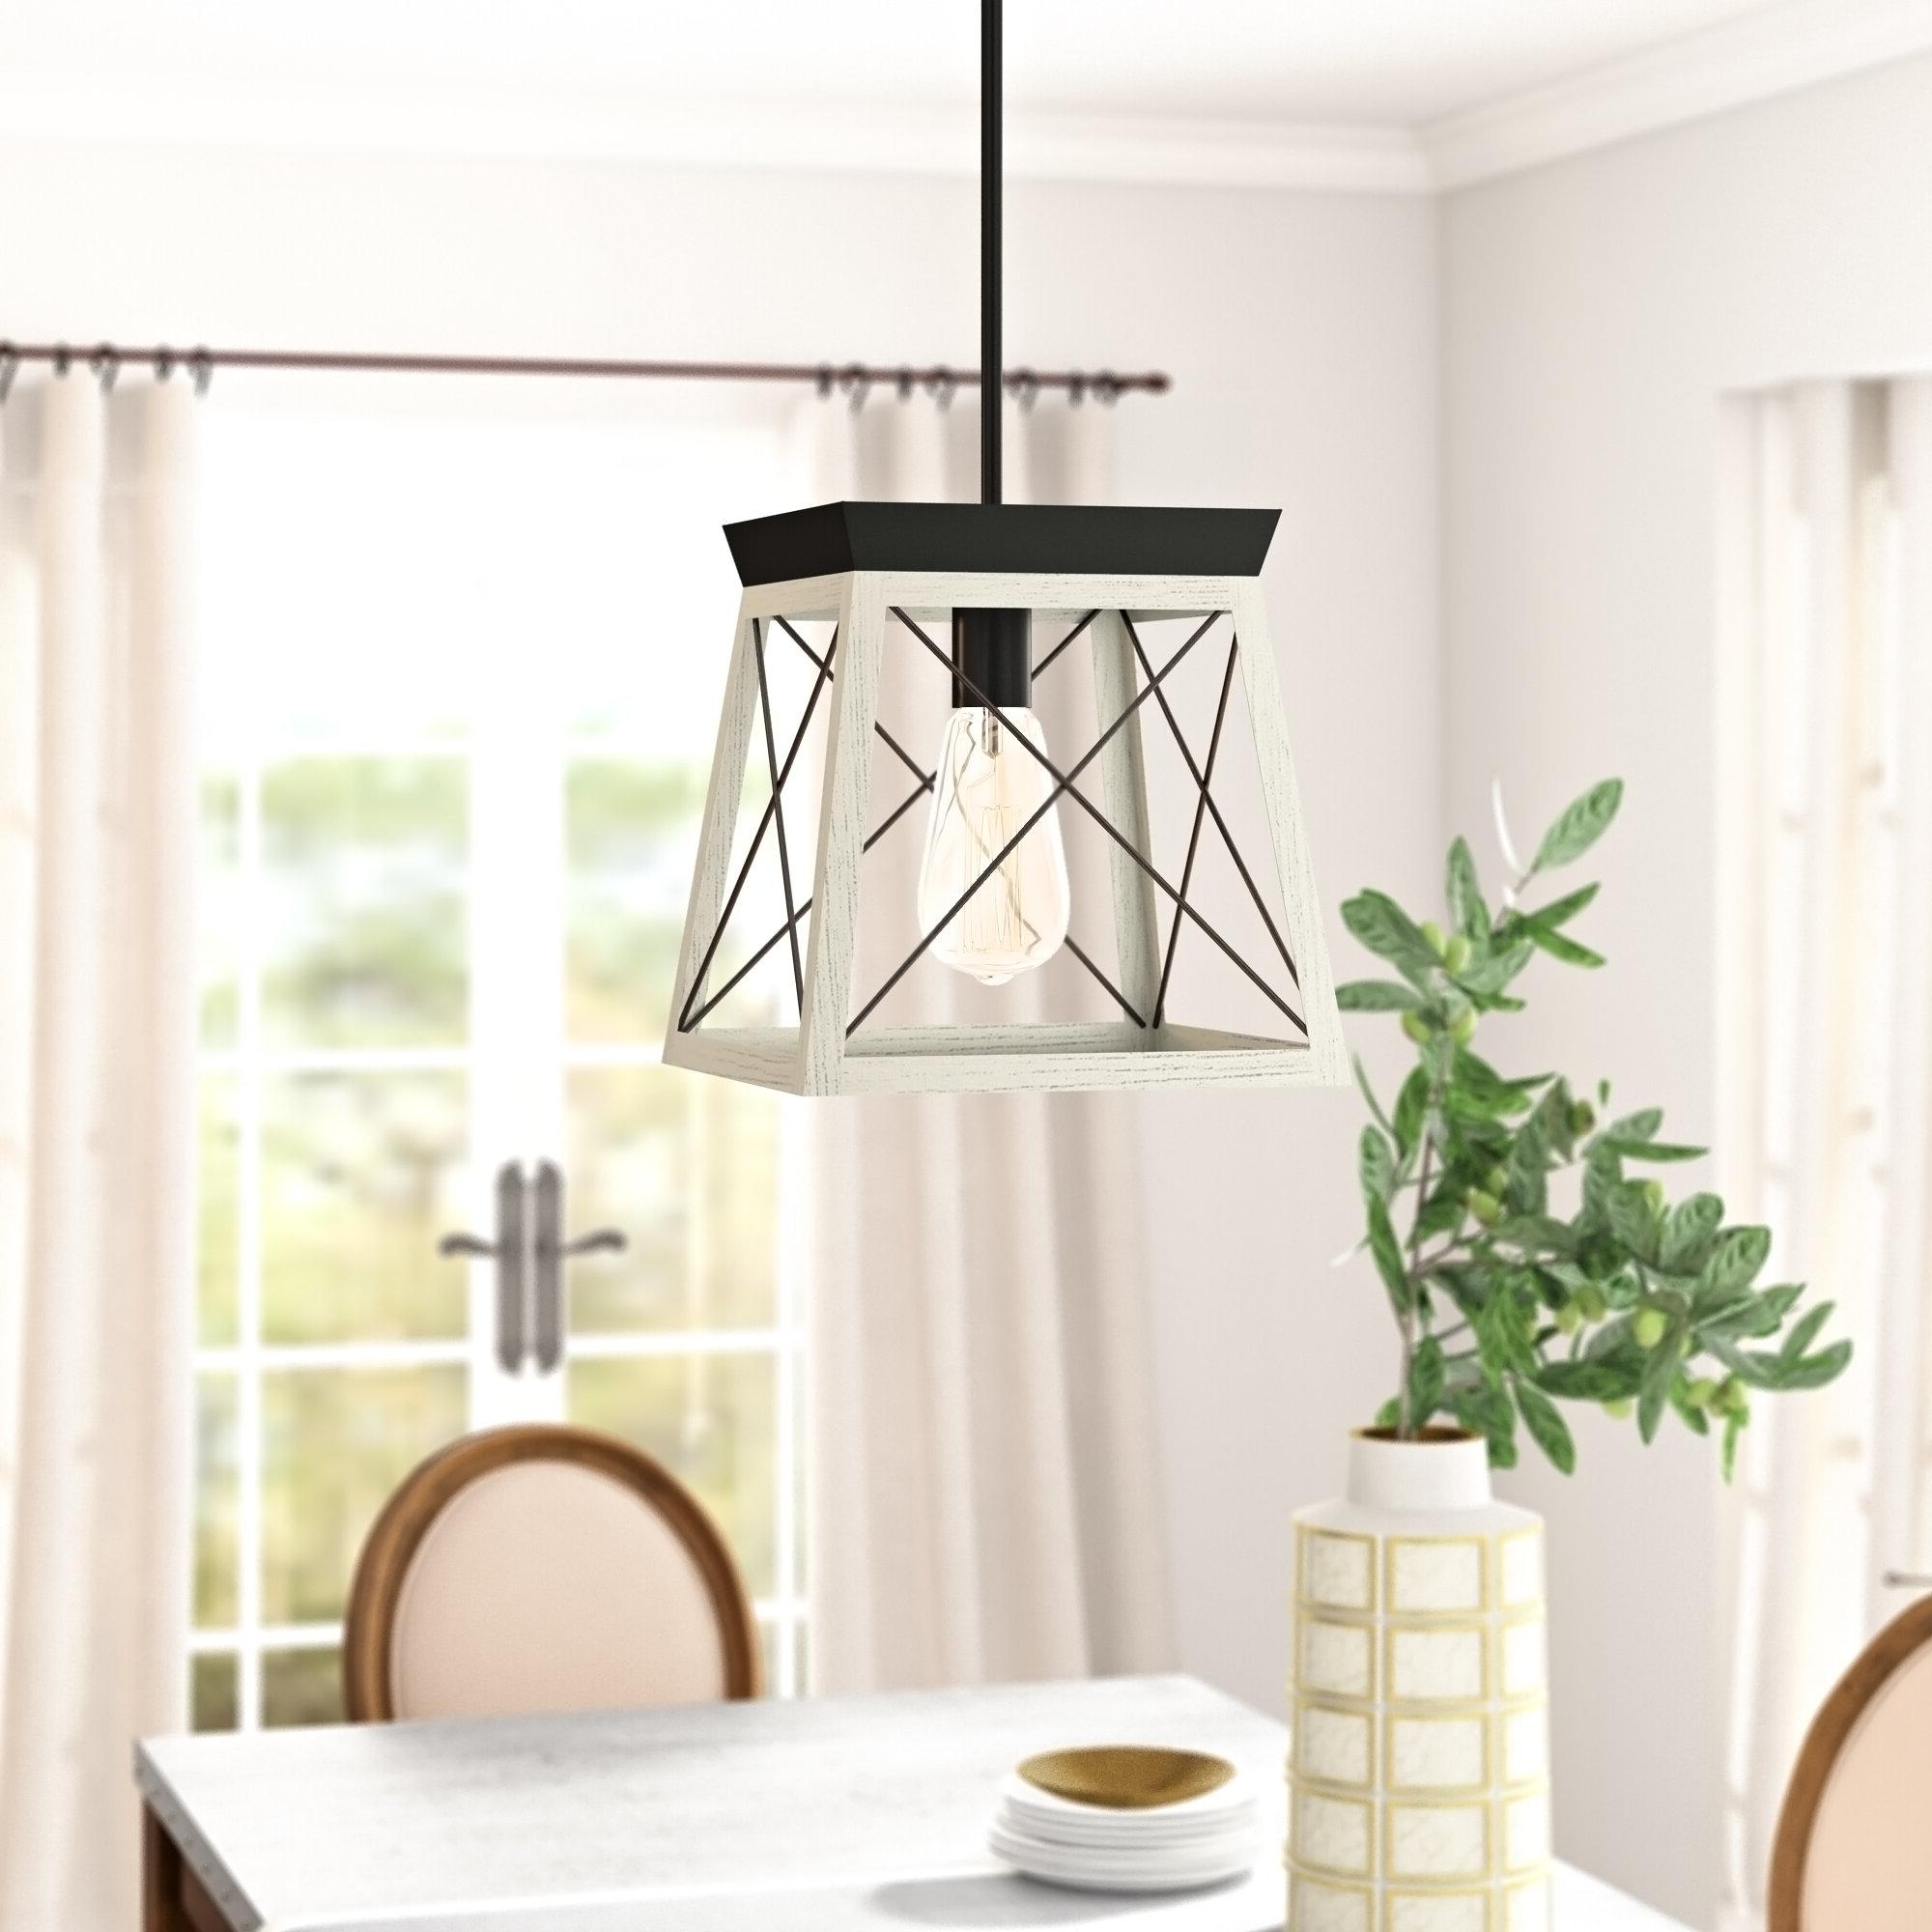 Best And Newest Delon 1 Light Lantern Geometric Pendant Regarding Delon 1 Light Lantern Geometric Pendants (View 4 of 25)